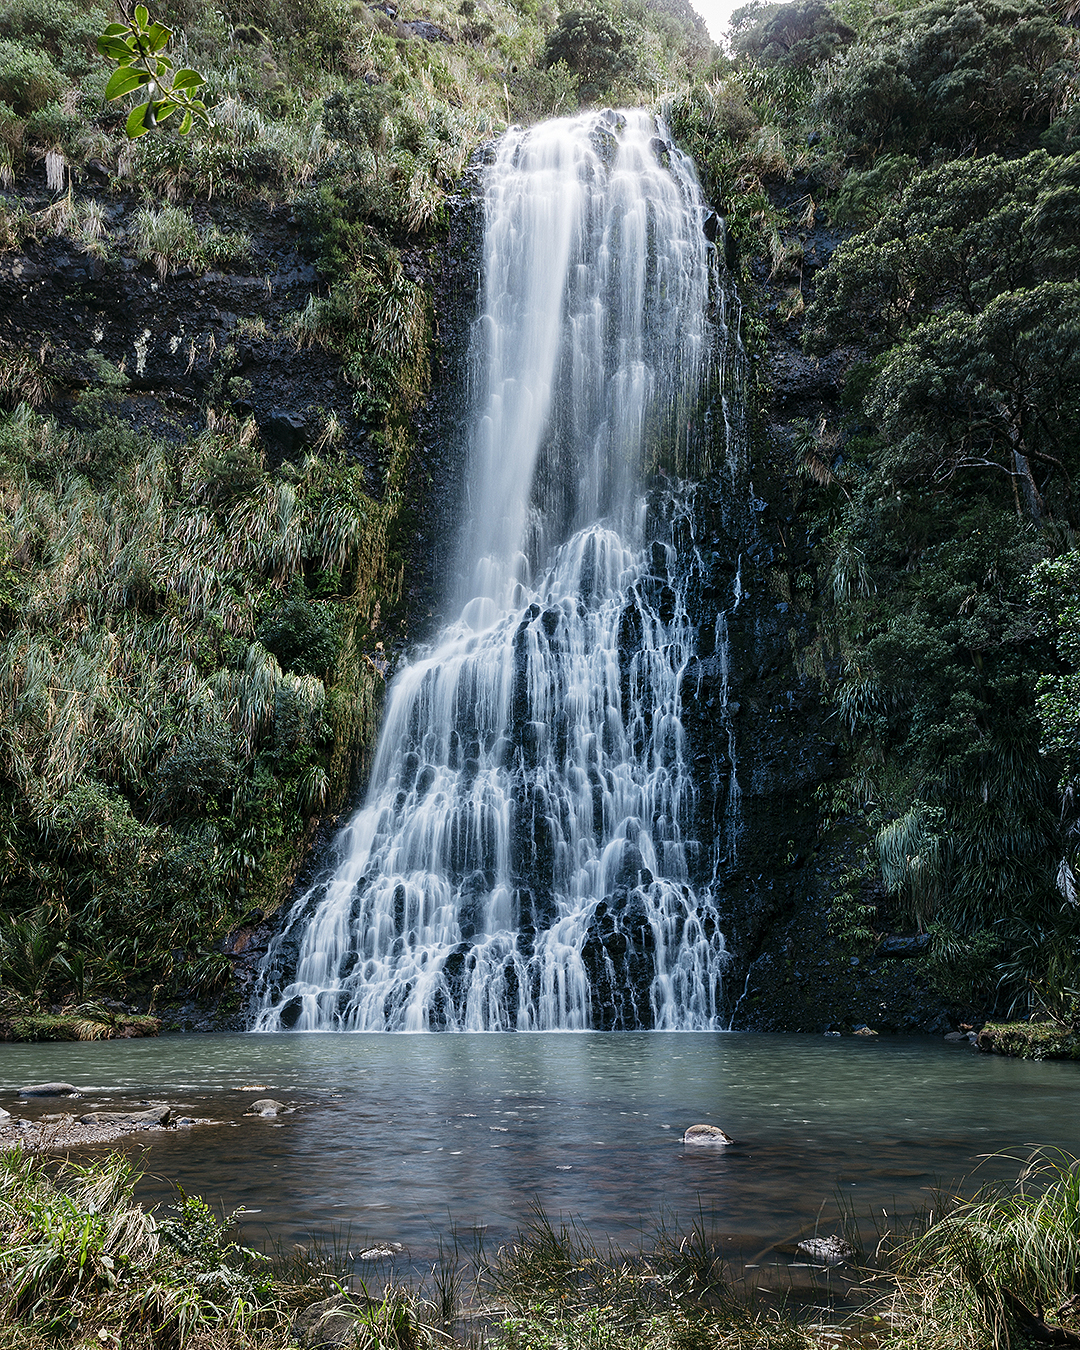 The cascading waterfall at Karekare falls looks beautiful.